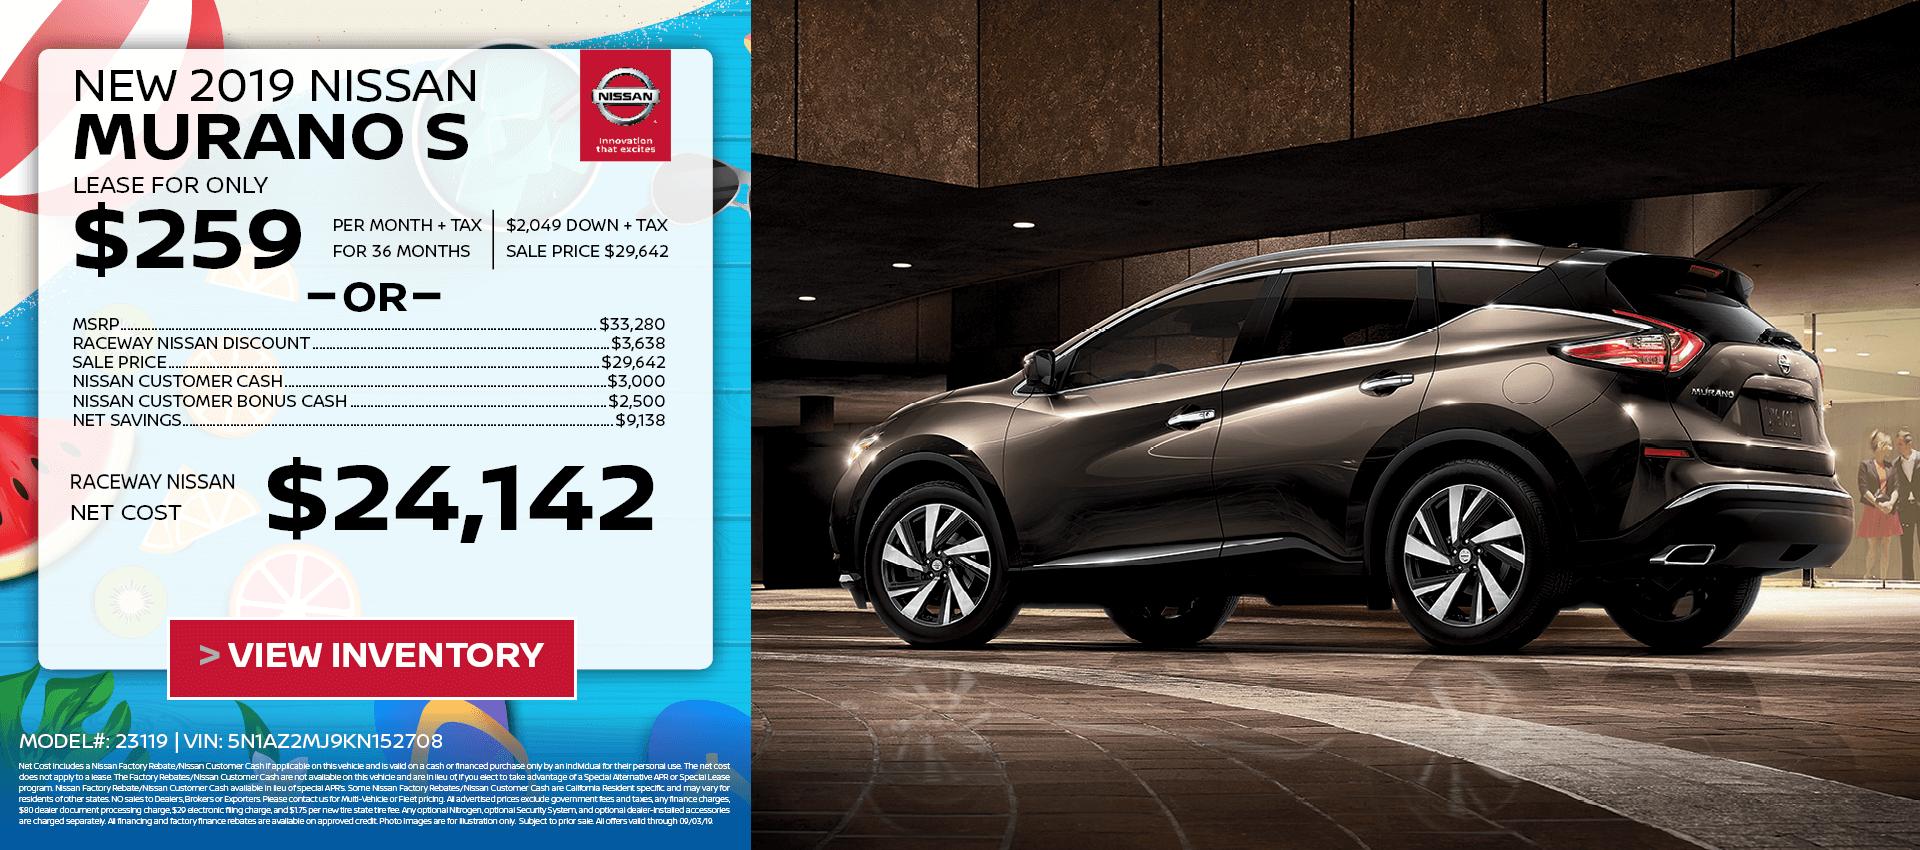 Nissan Murano $259 Lease